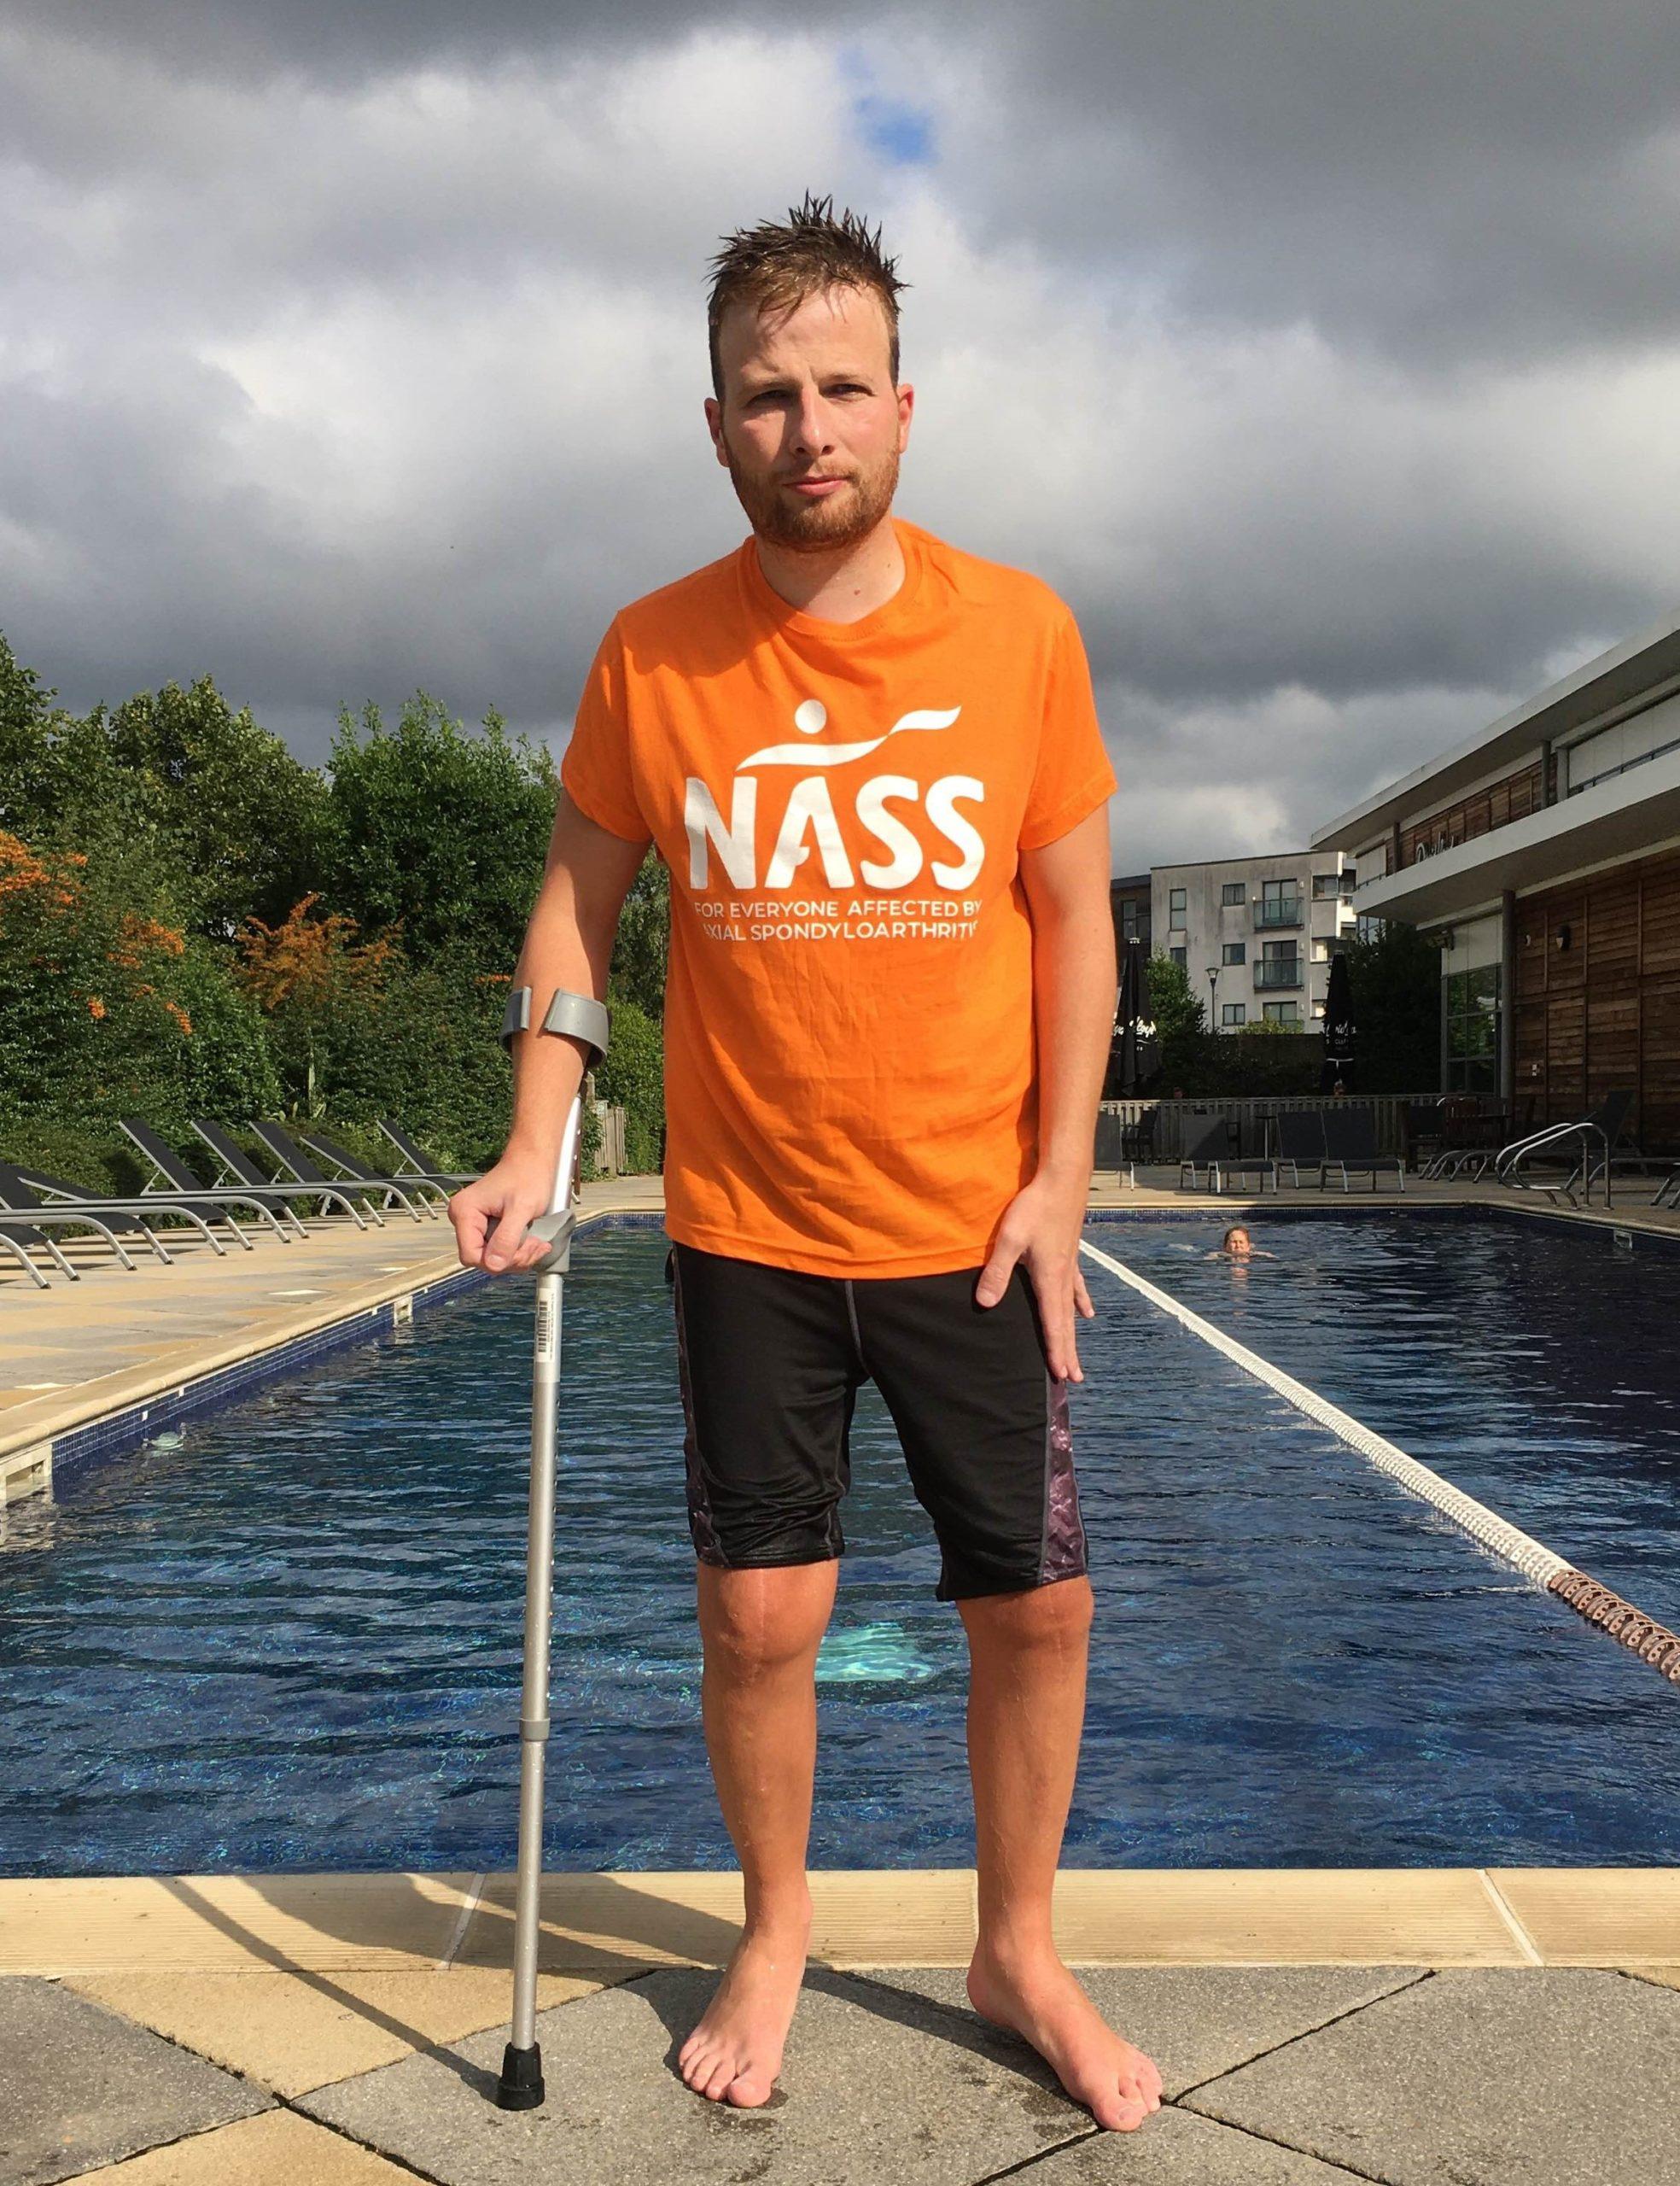 Darren Fletcher in a NASS t-shirt by the pool